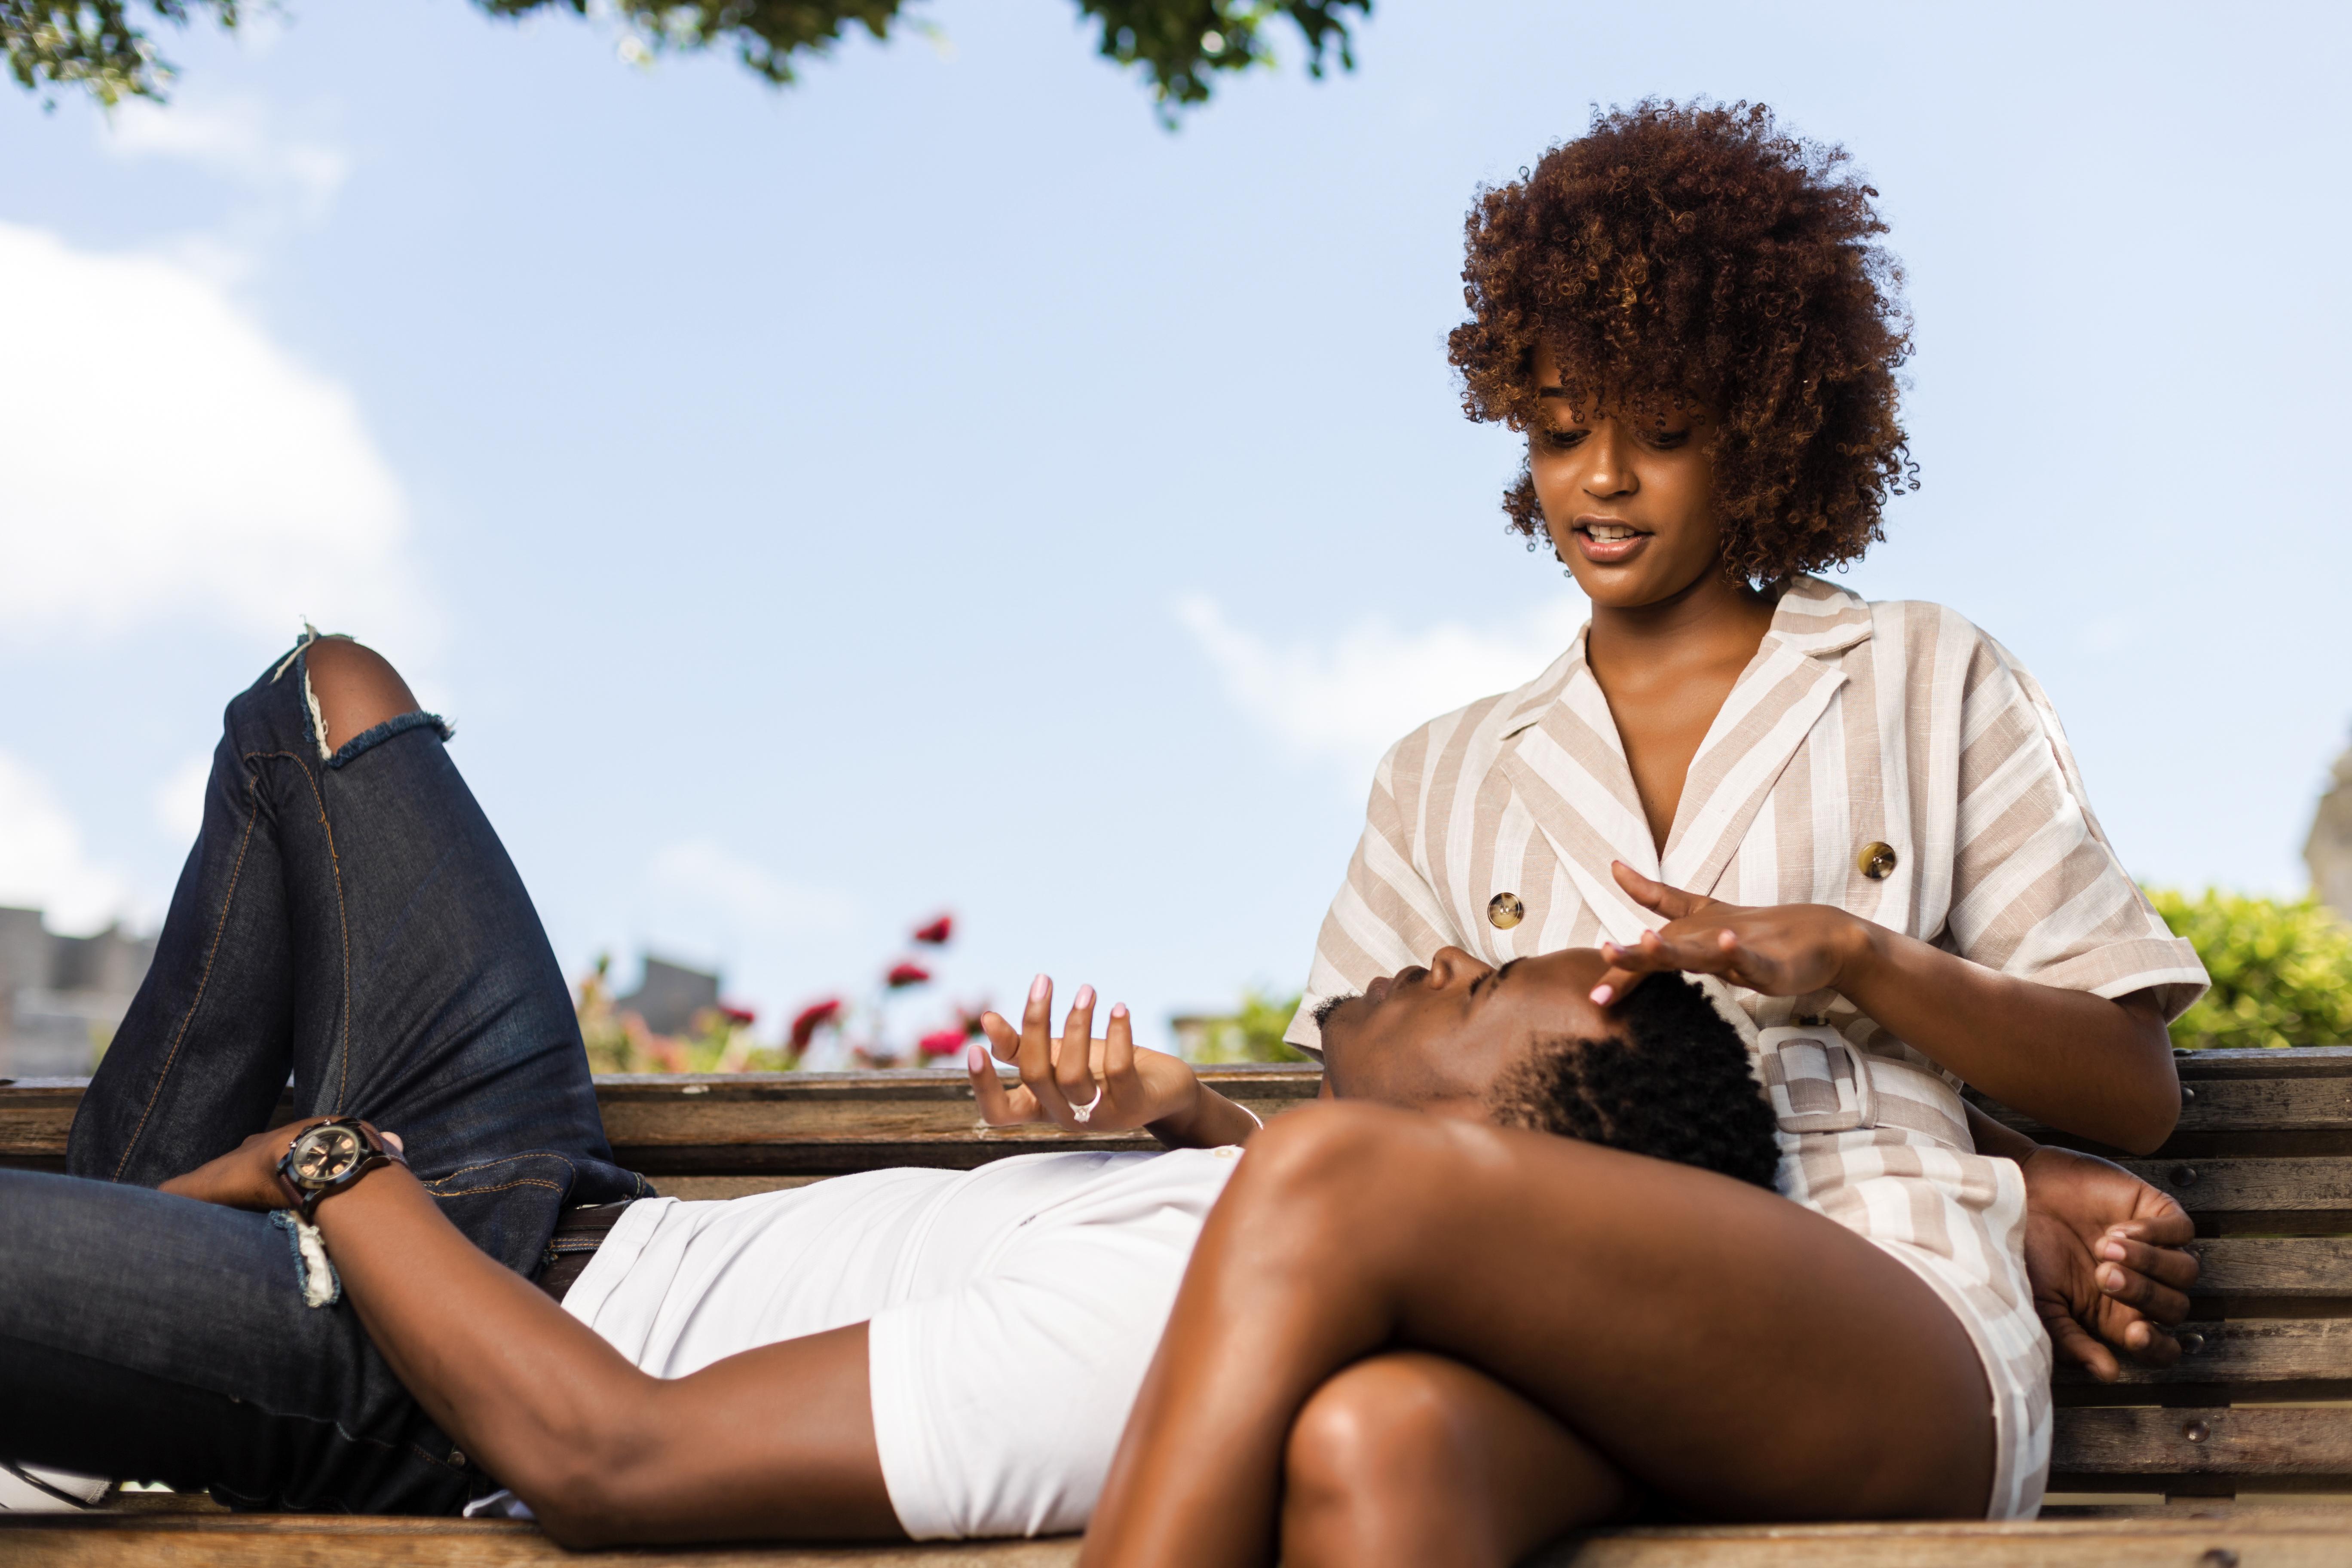 Meeting older women in the bahamas